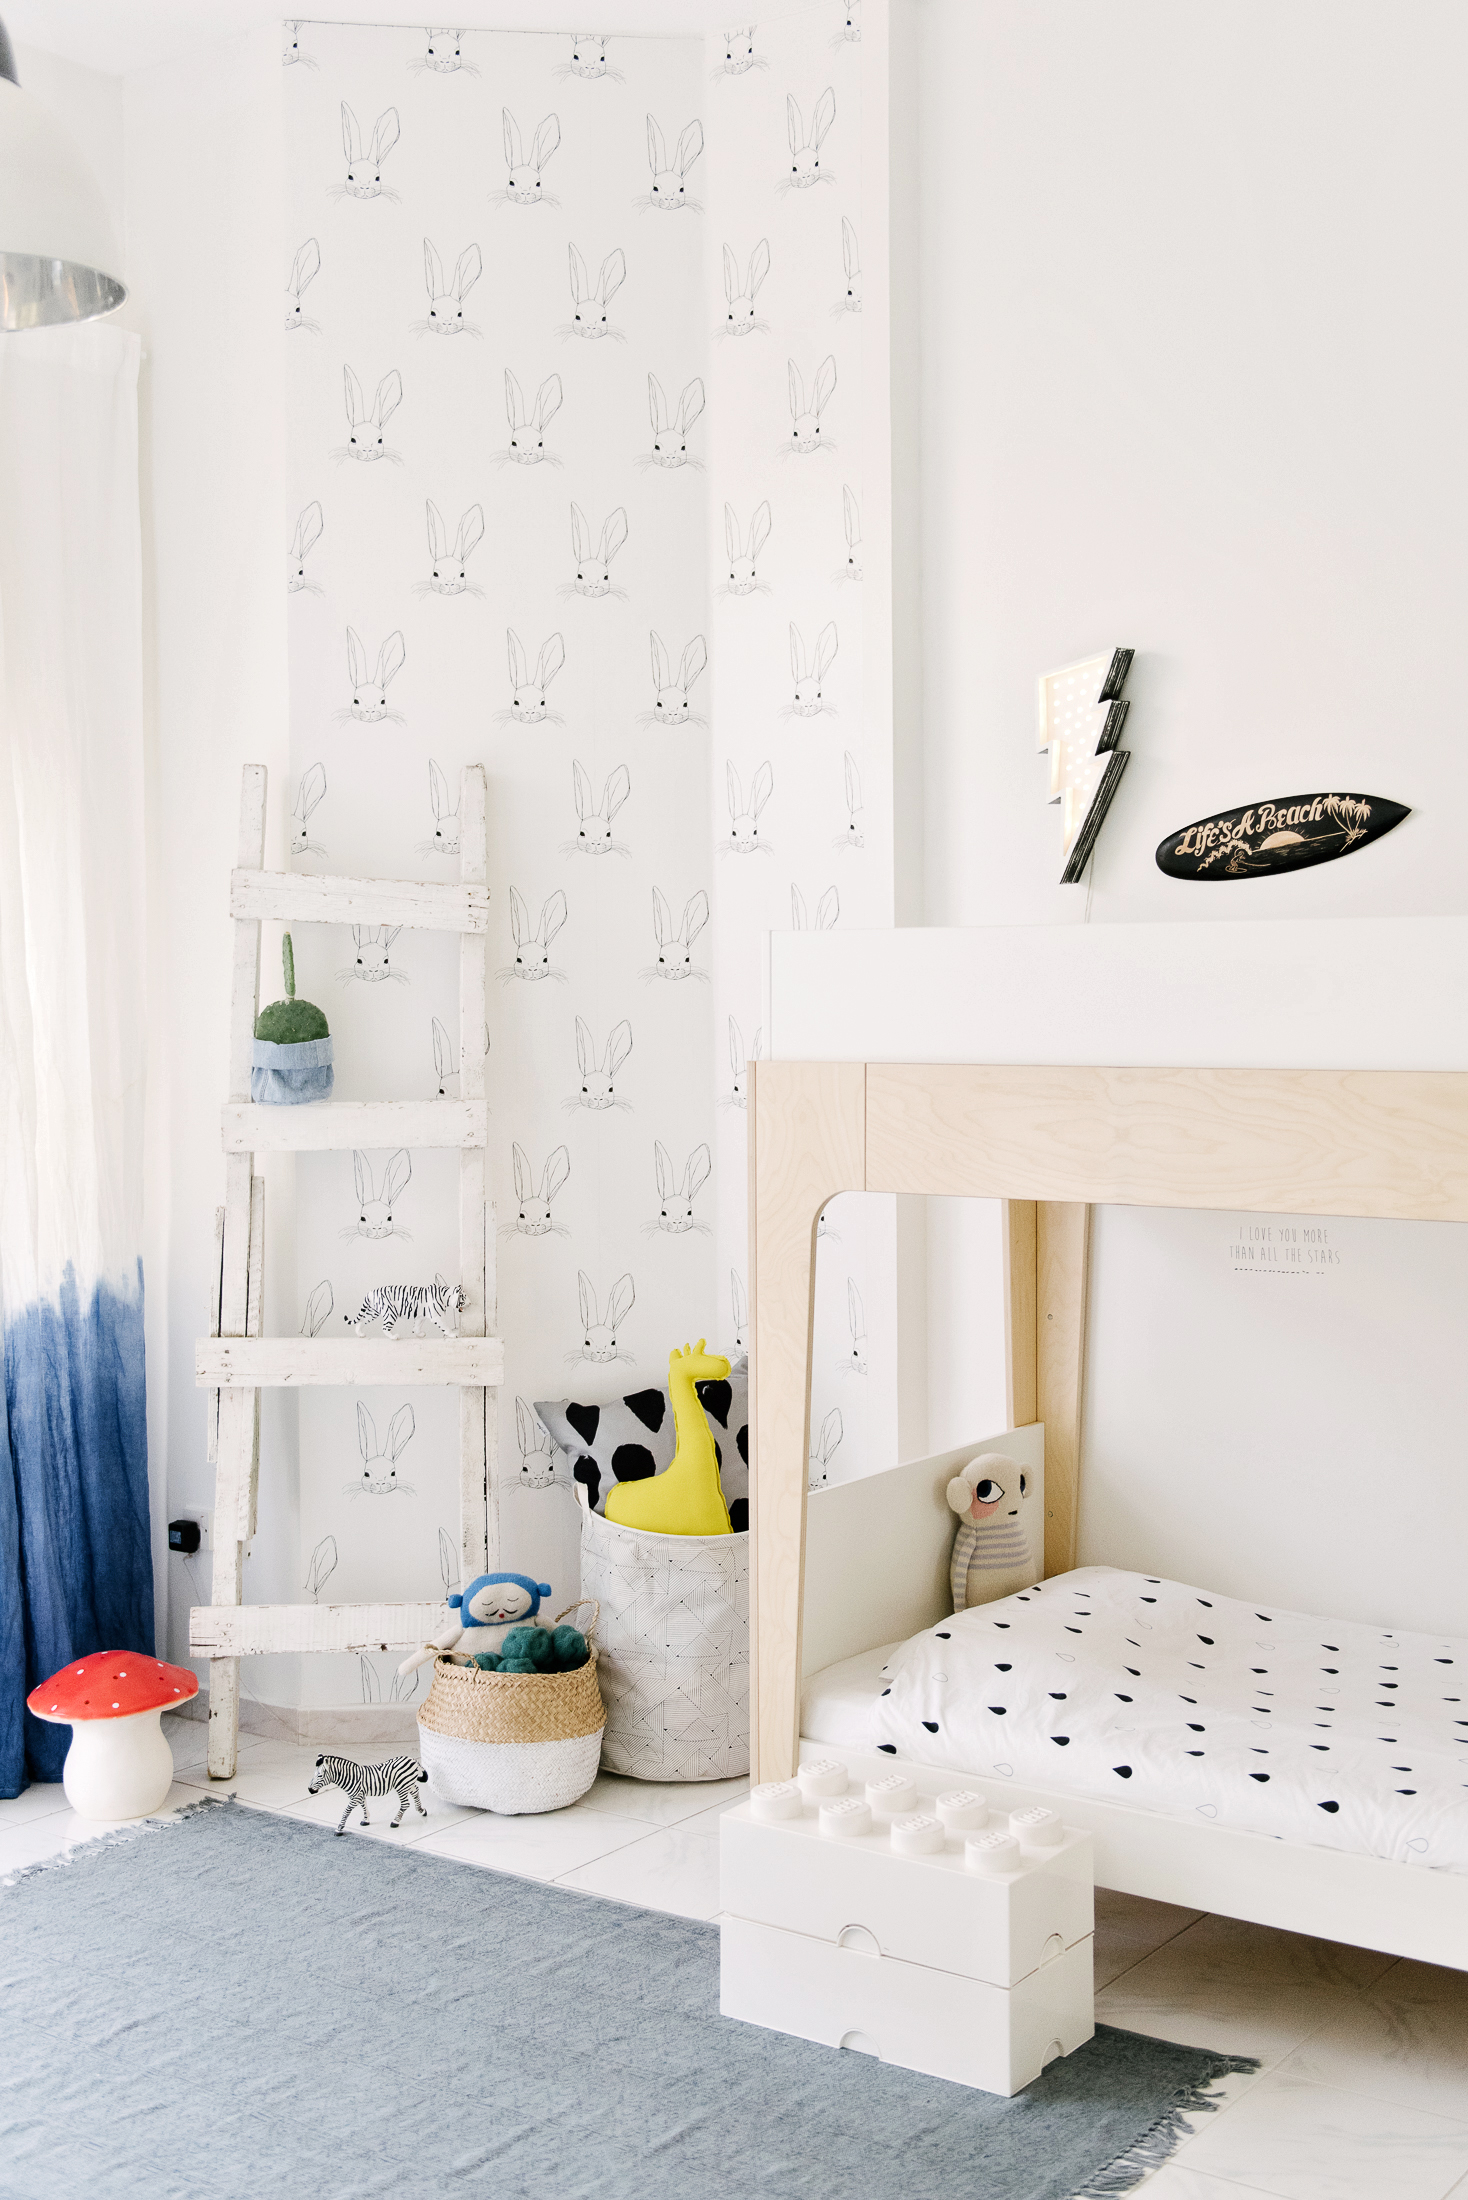 blackandwhite-wallpaper-1